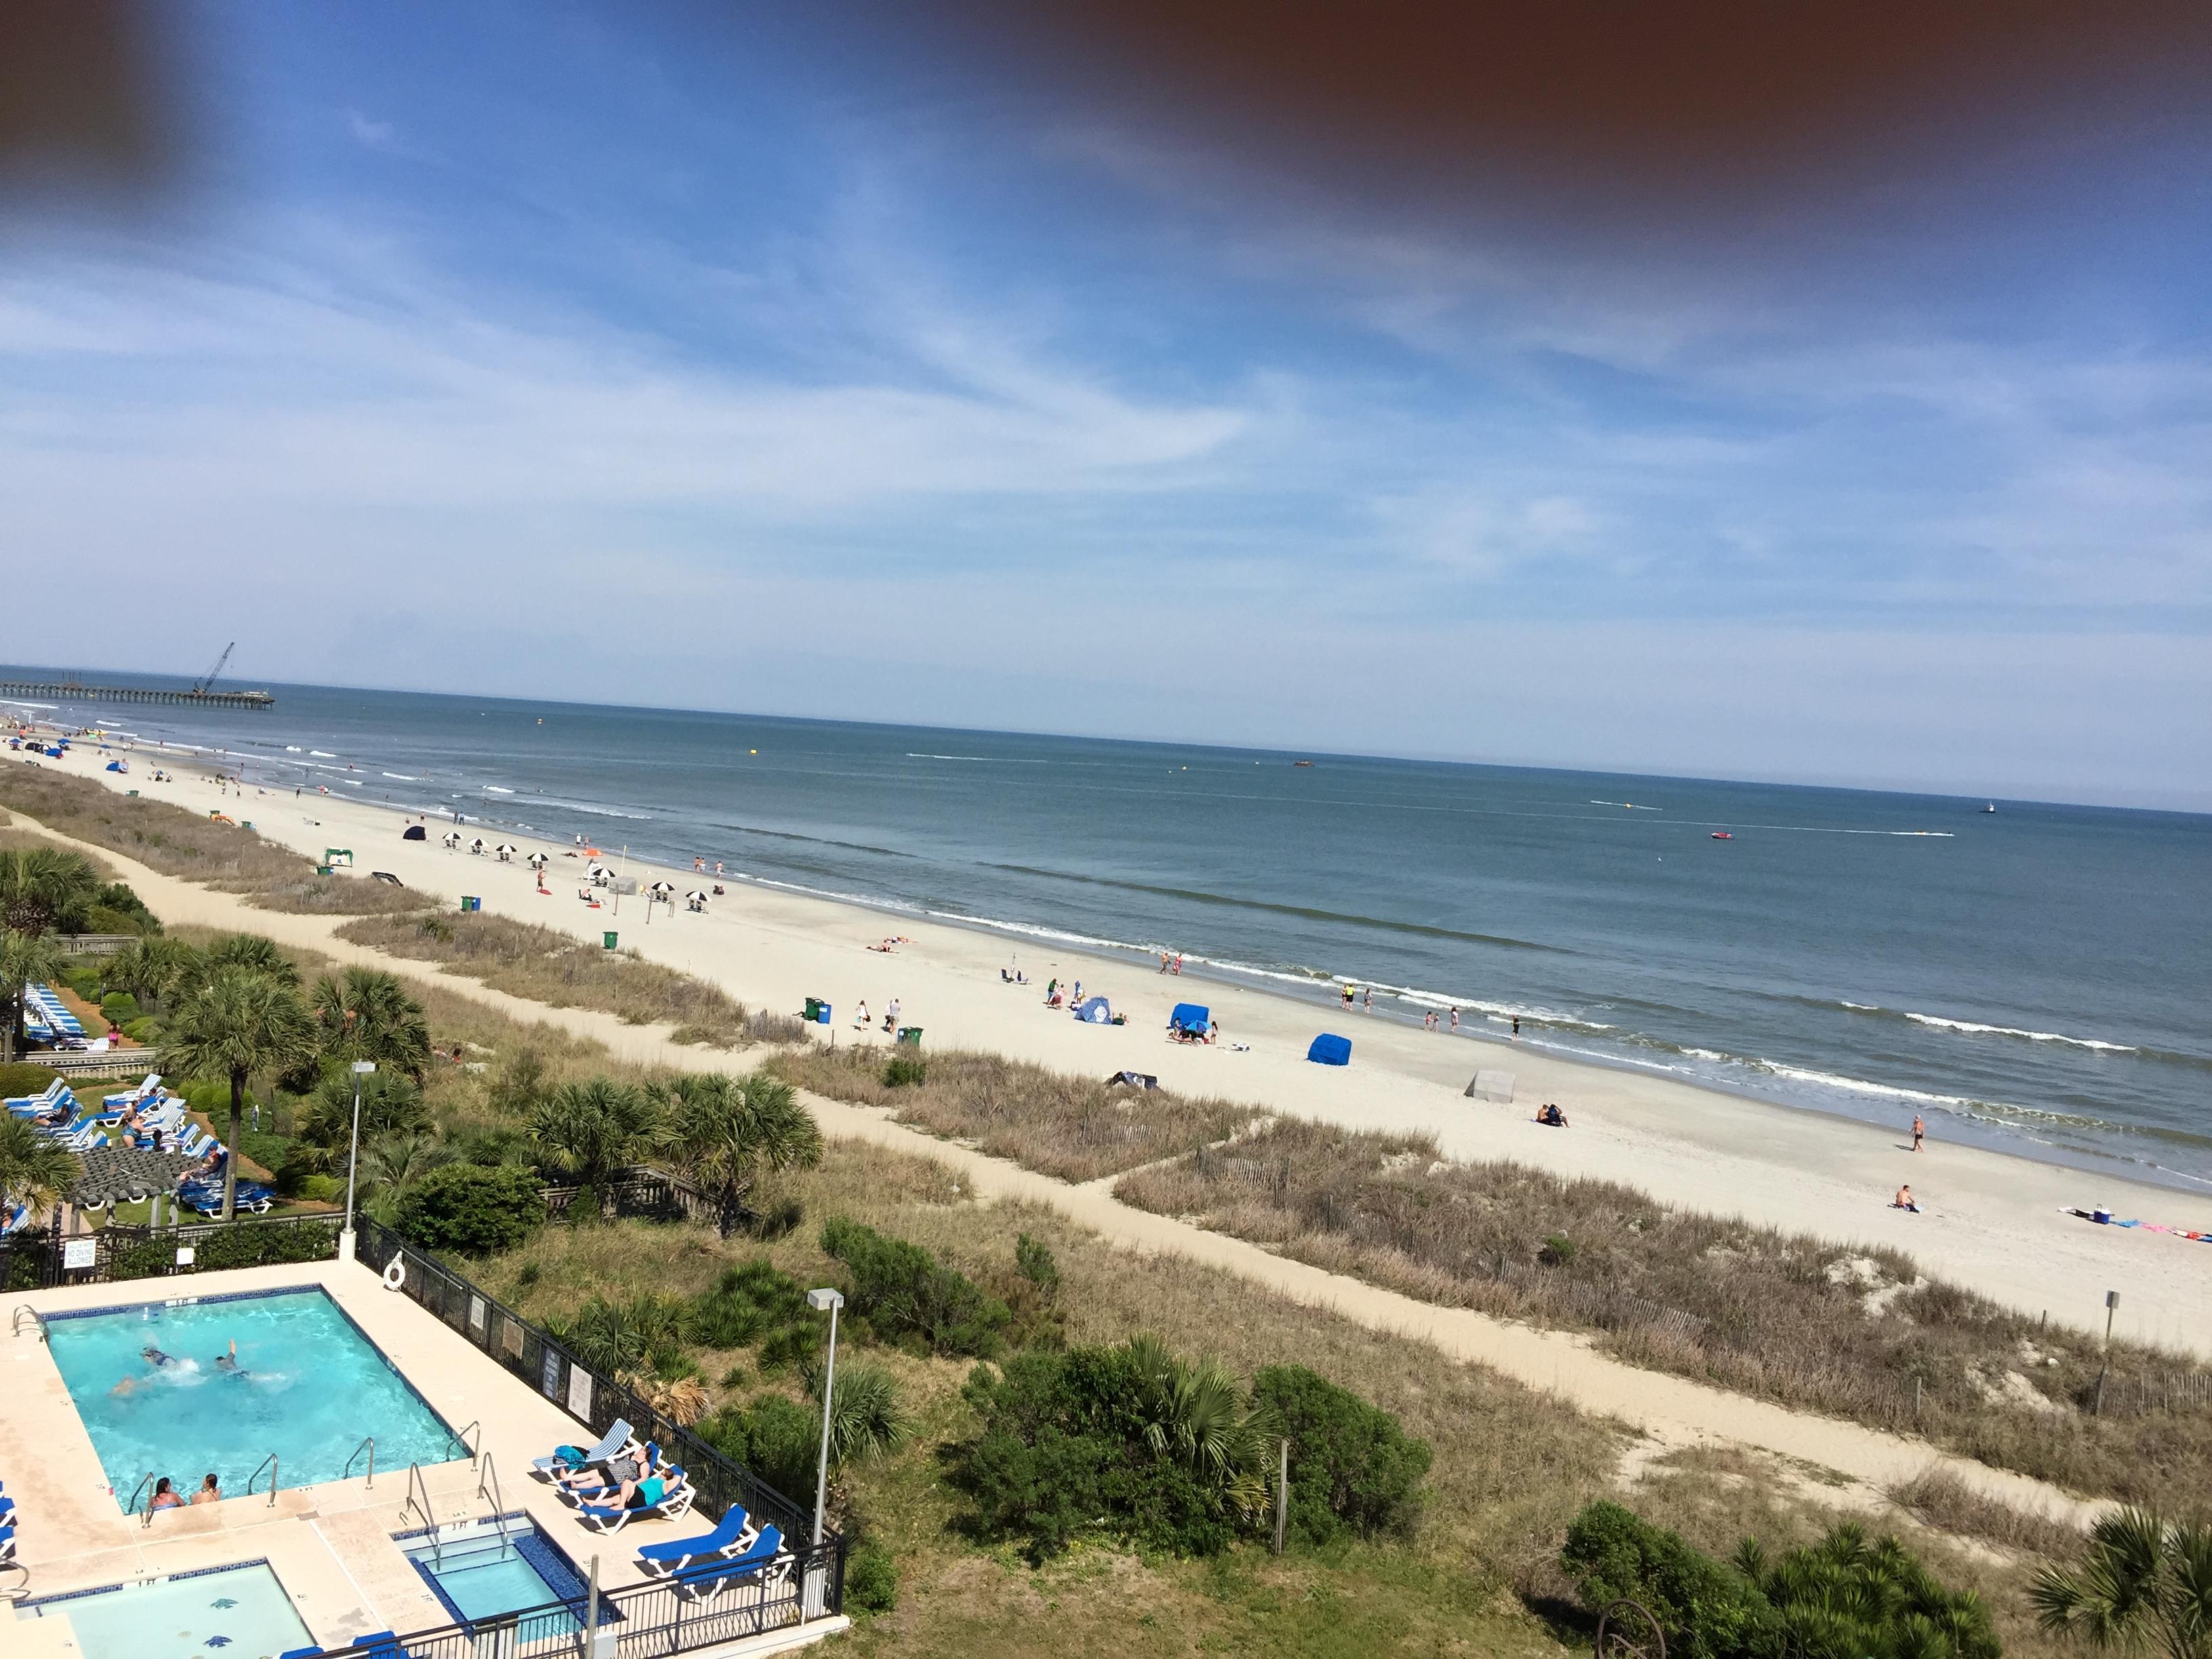 Captain S Quarters Resort In Myrtle Beach Hotel Rates Reviews On Orbitz